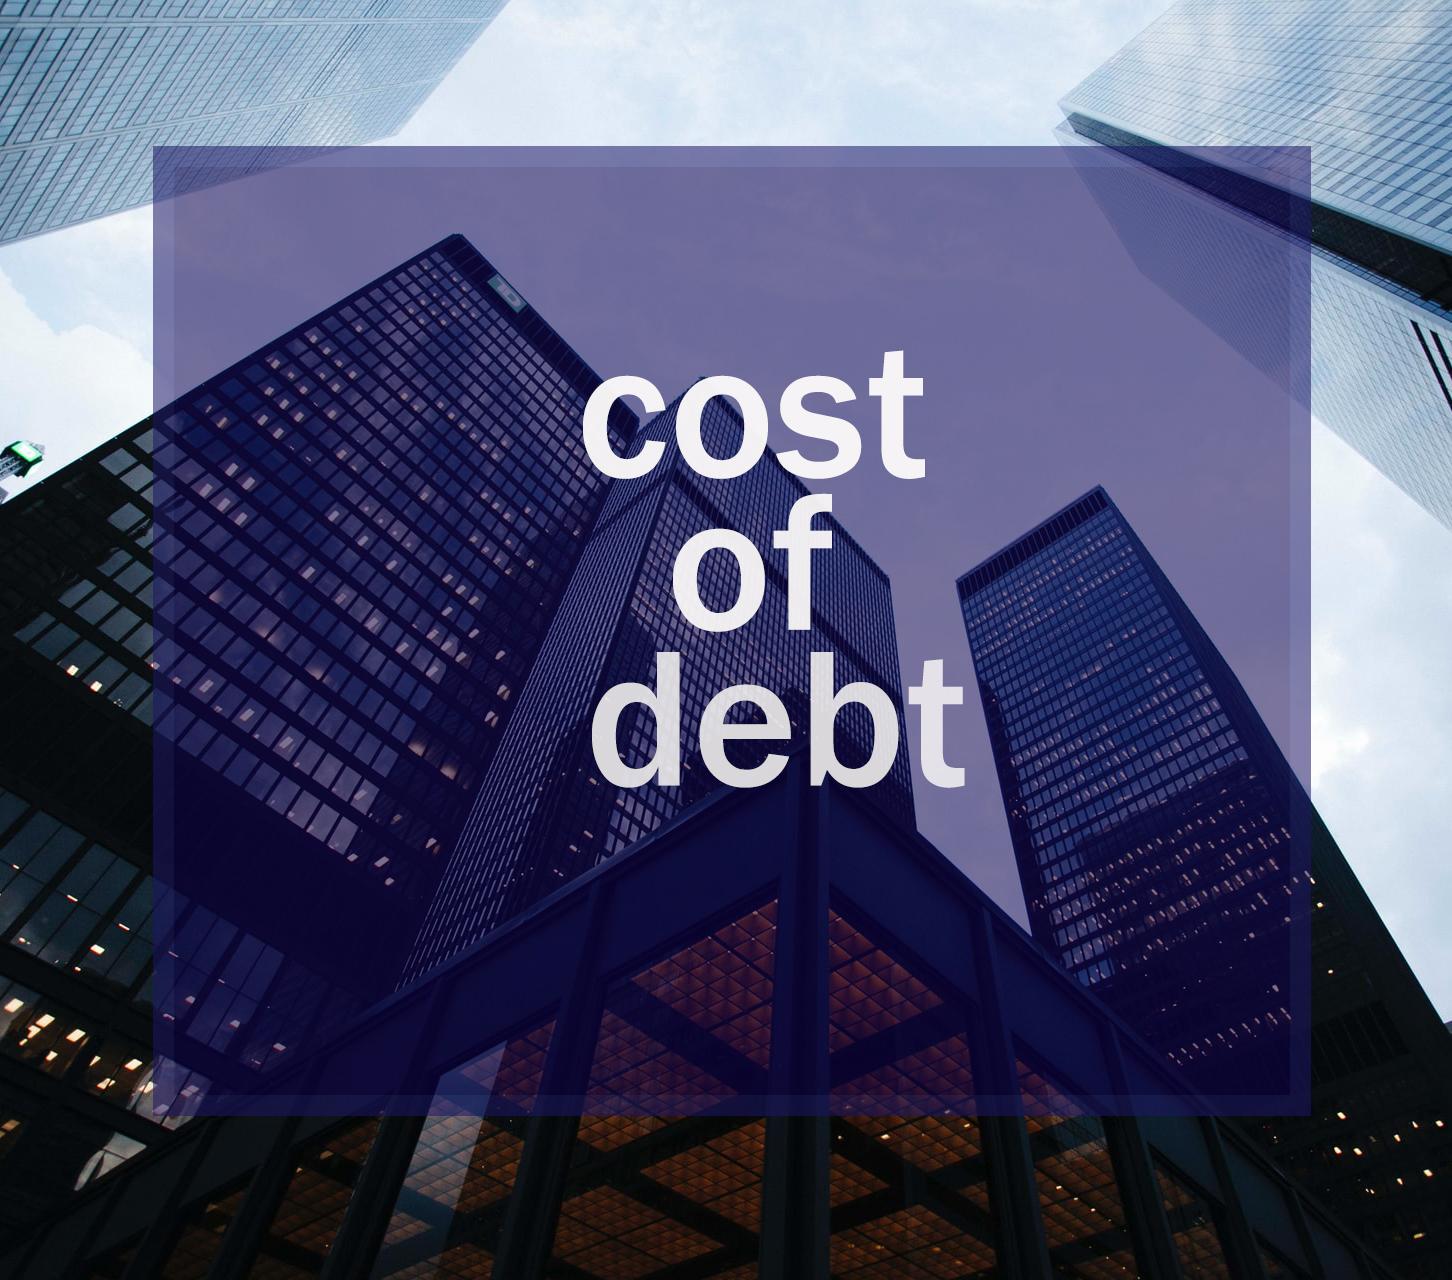 Cara menghitung Cost Of Debt/Biaya Hutang